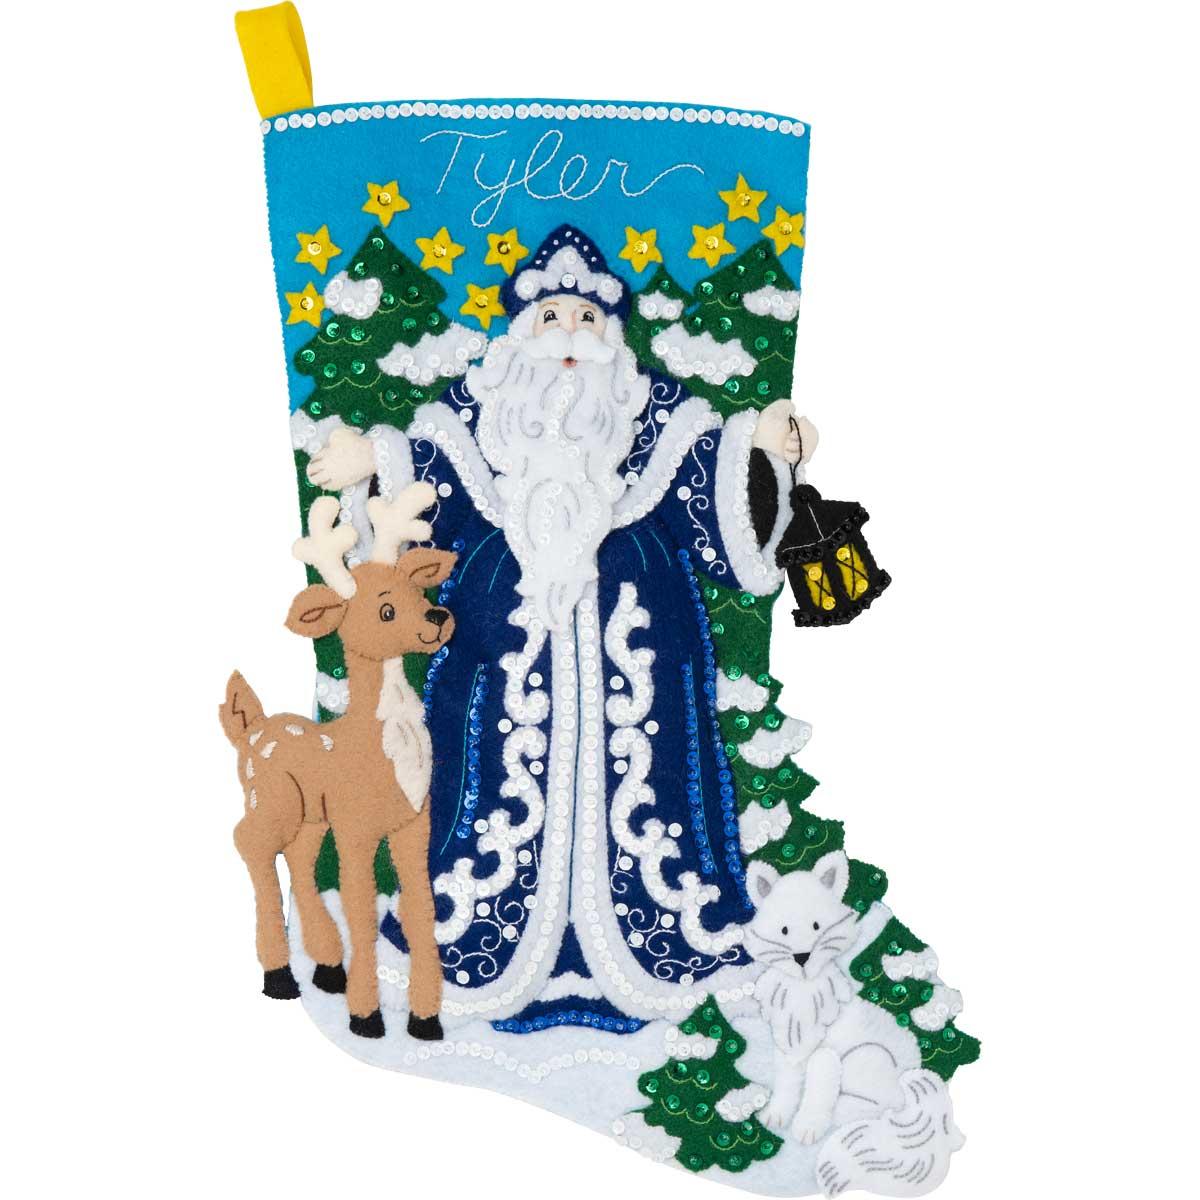 Bucilla ® Seasonal - Felt - Stocking Kits - Winter Santa - 86935E